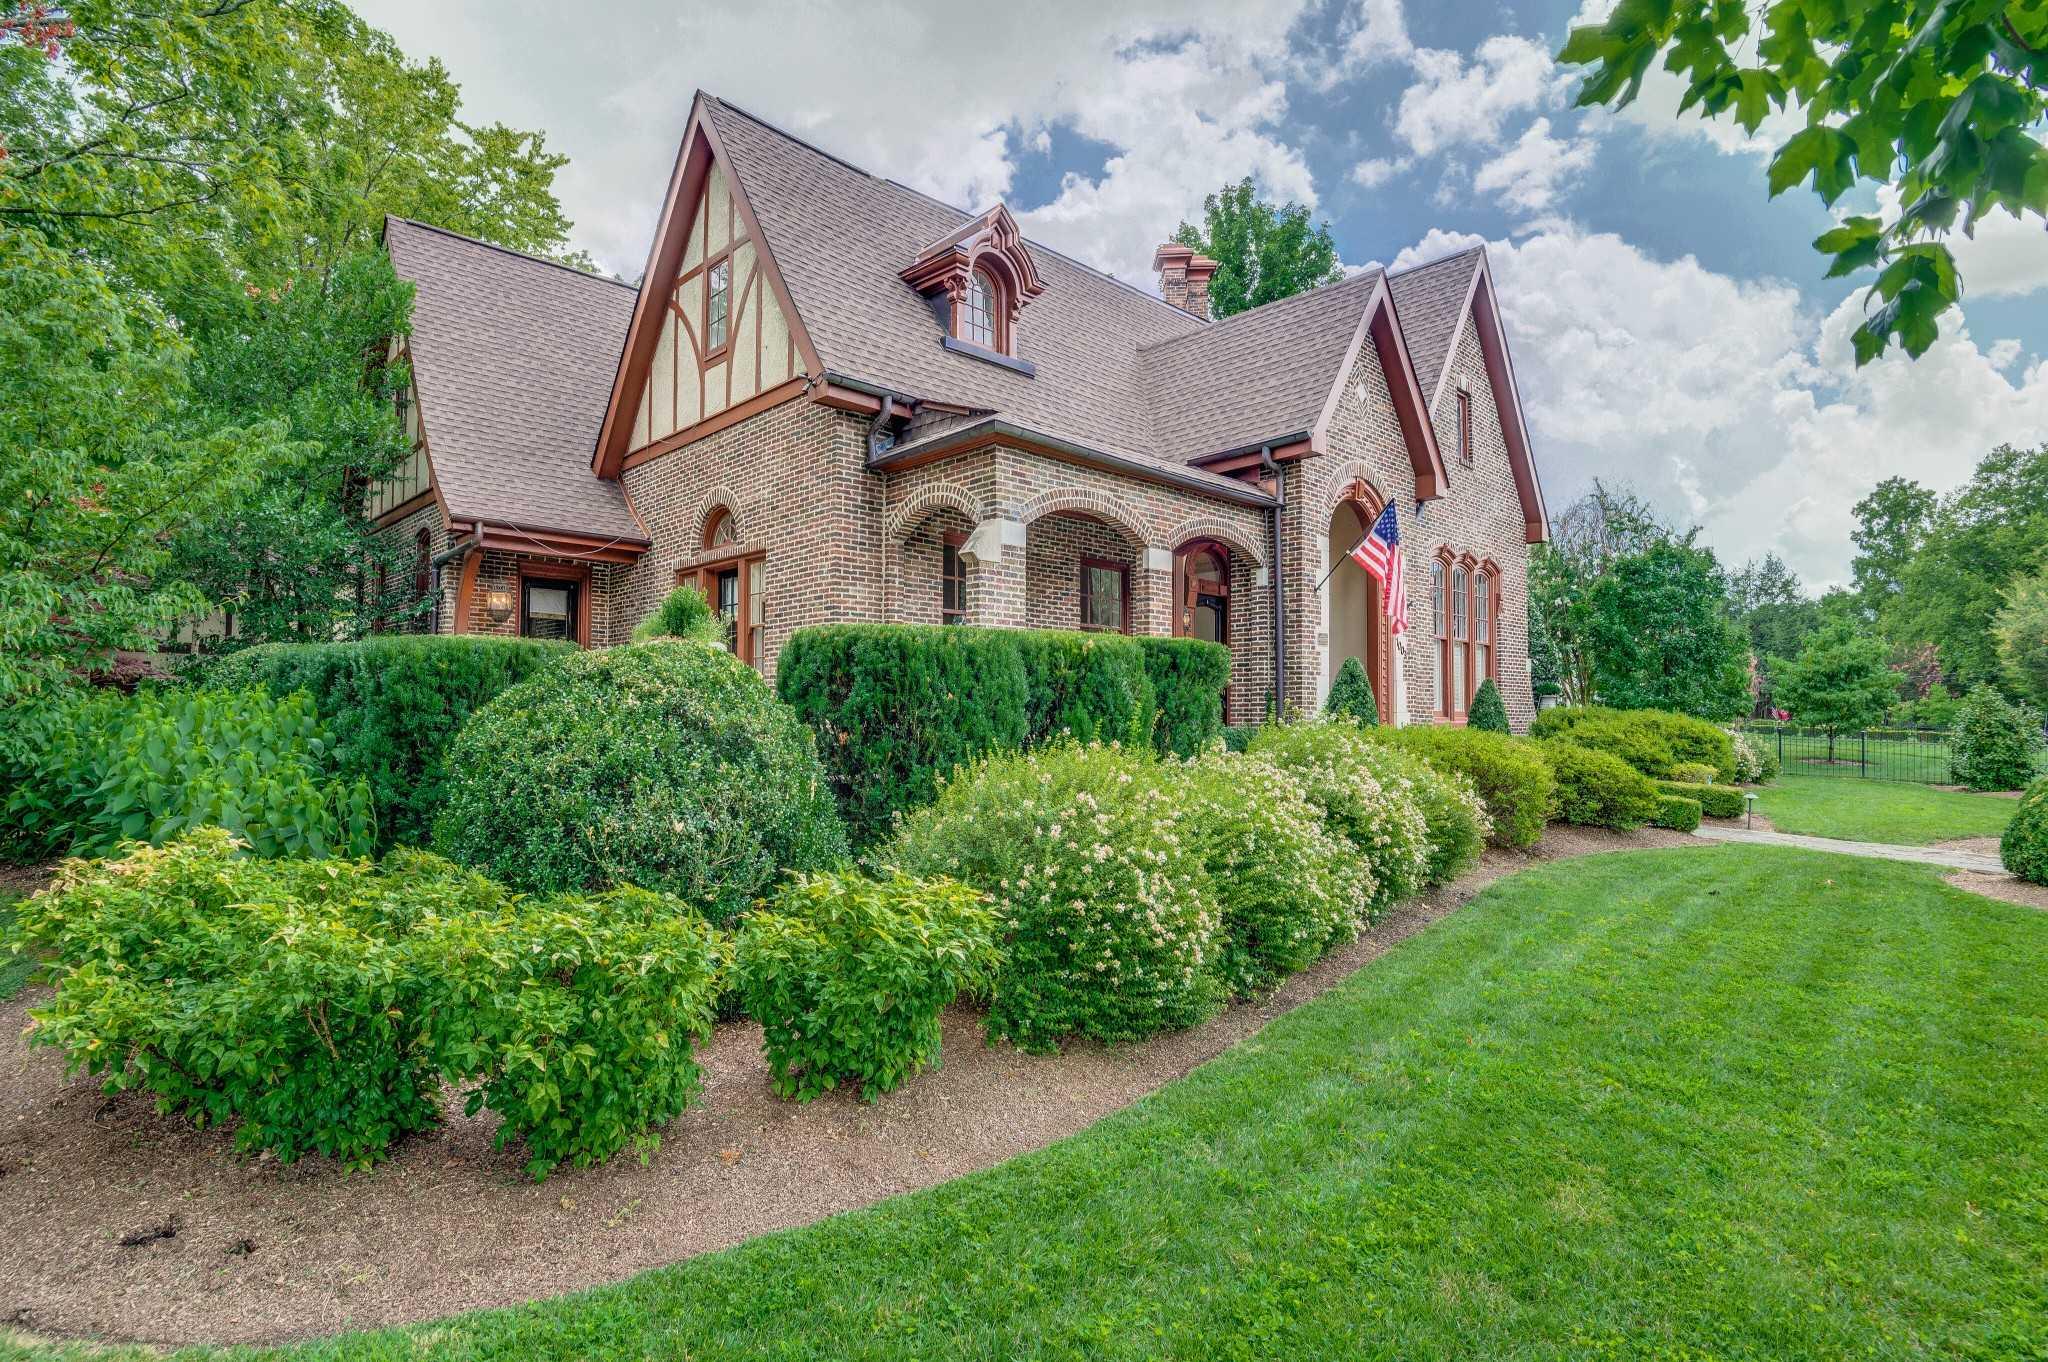 $2,695,000 - 5Br/6Ba -  for Sale in Historic Franklin, Franklin